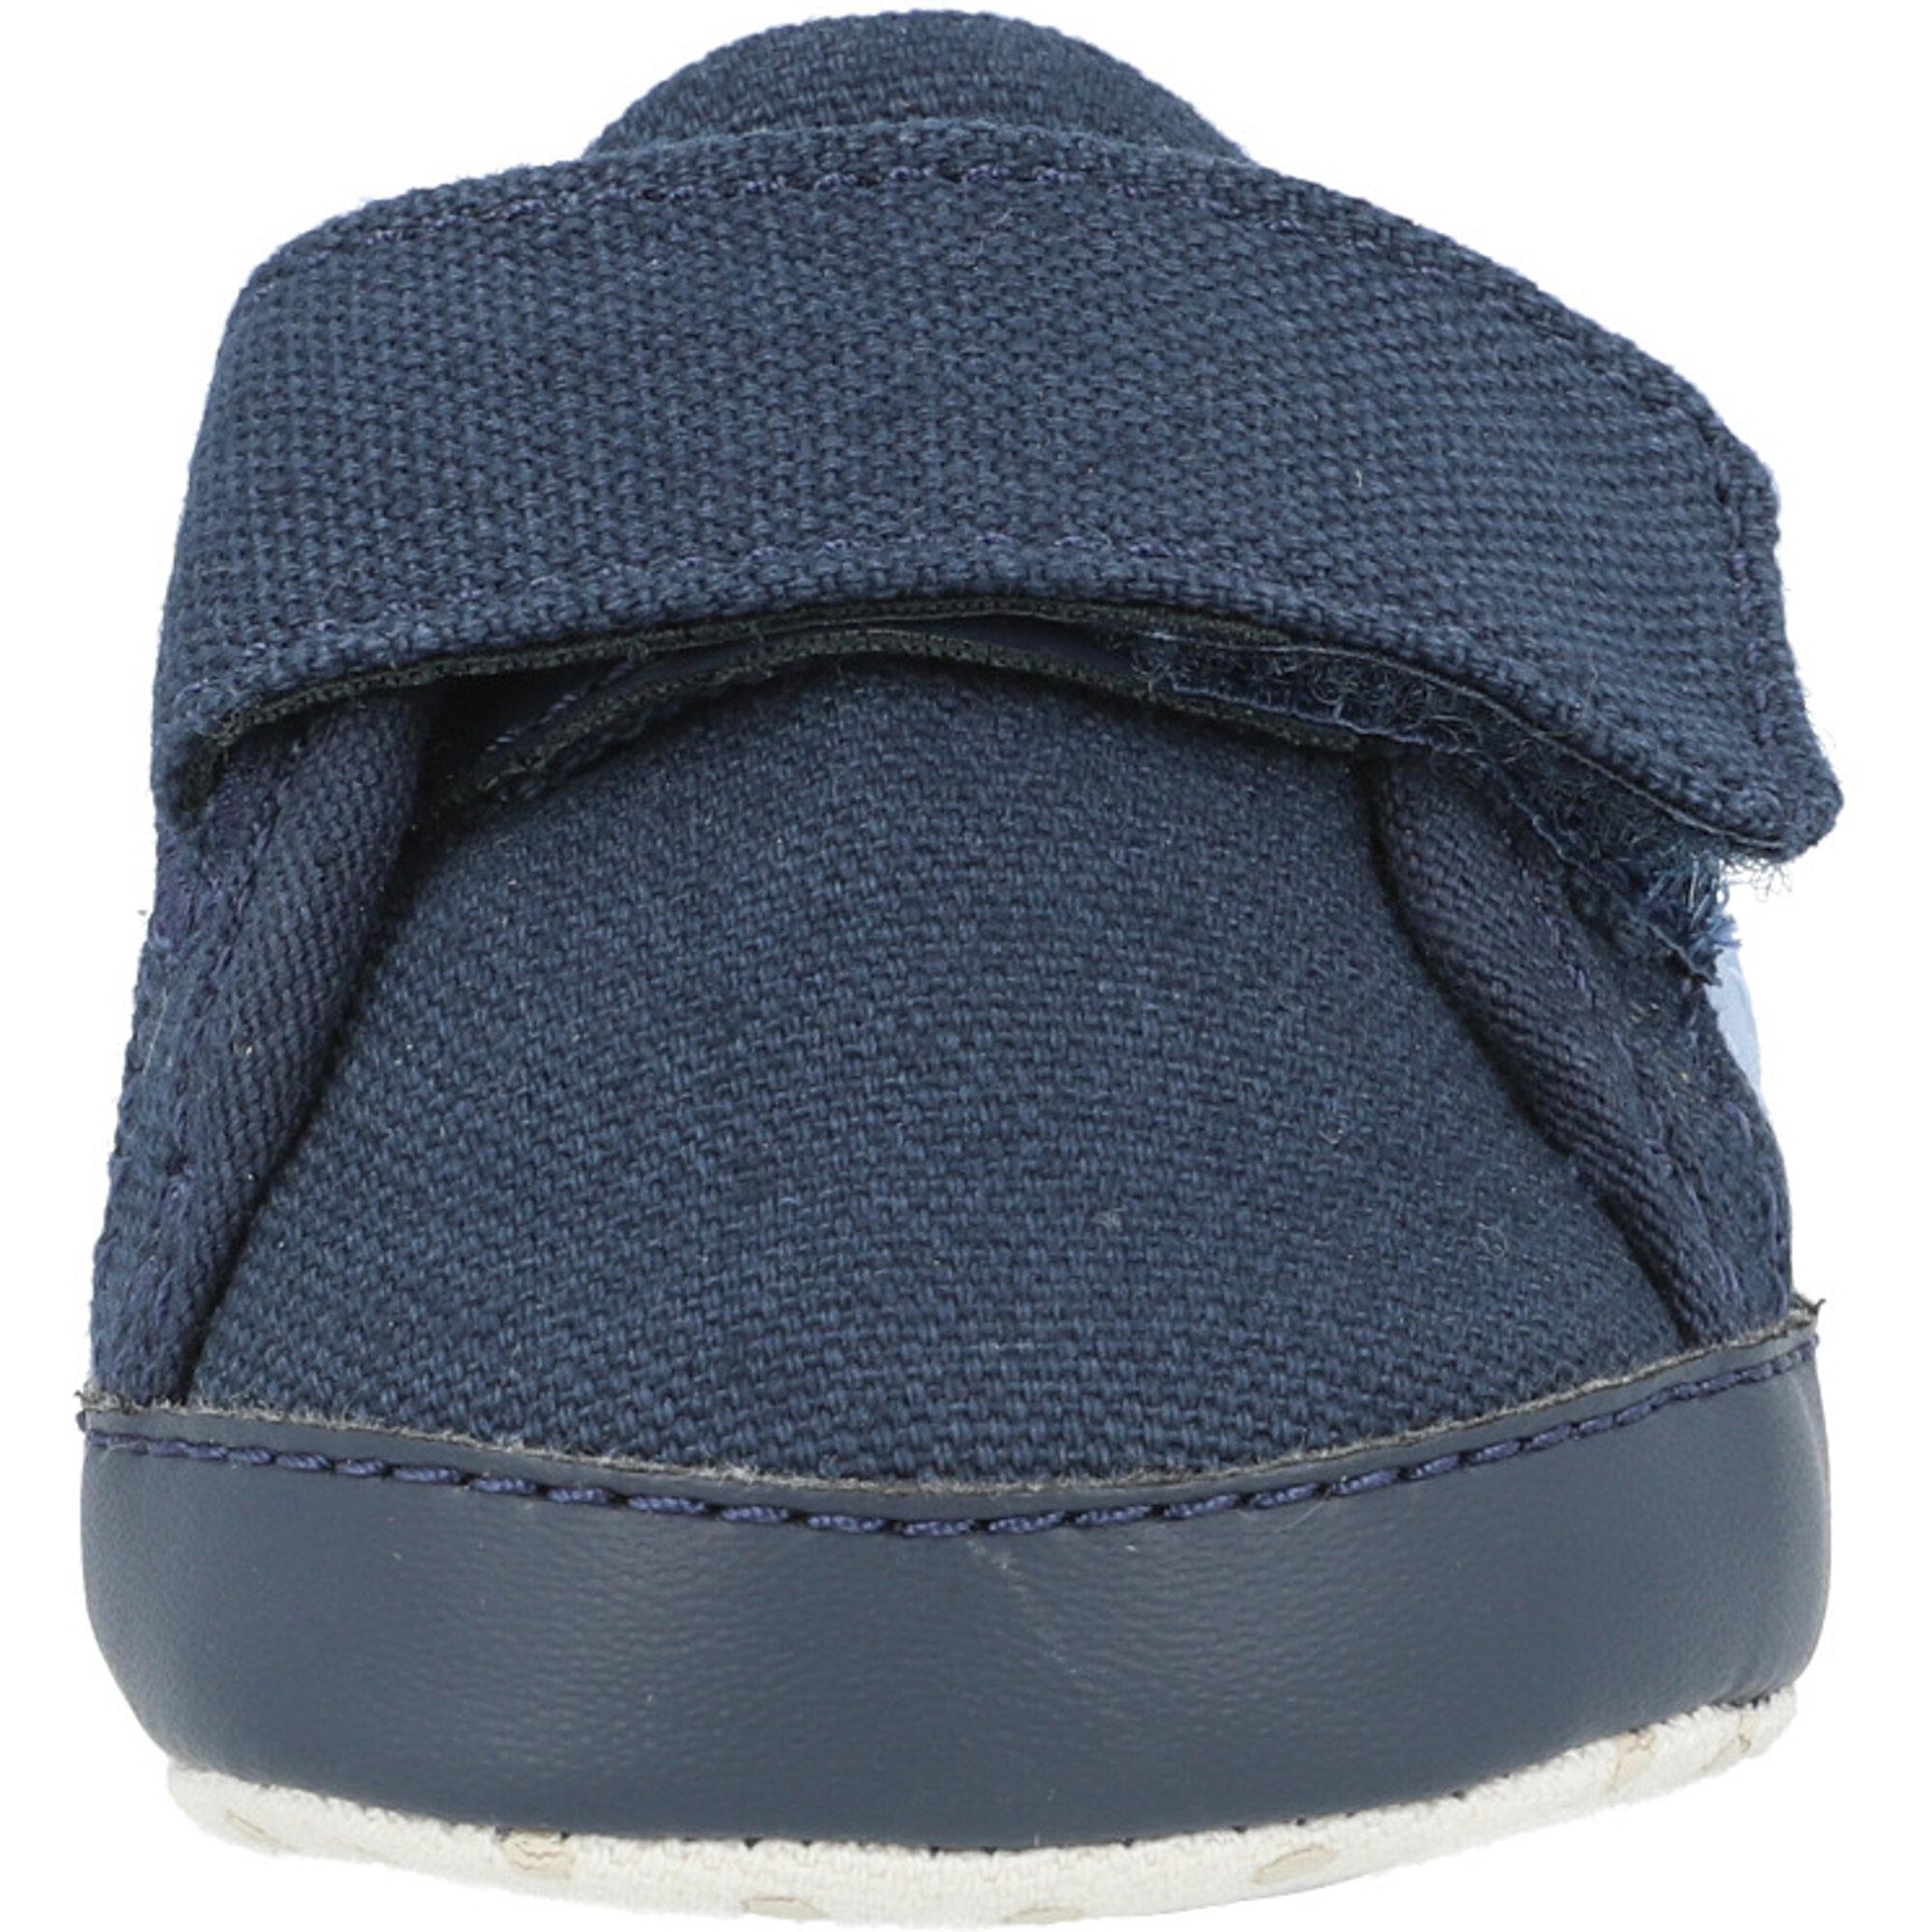 Lacoste Sideline Crib 0120 1 Light Blue/Navy Textile